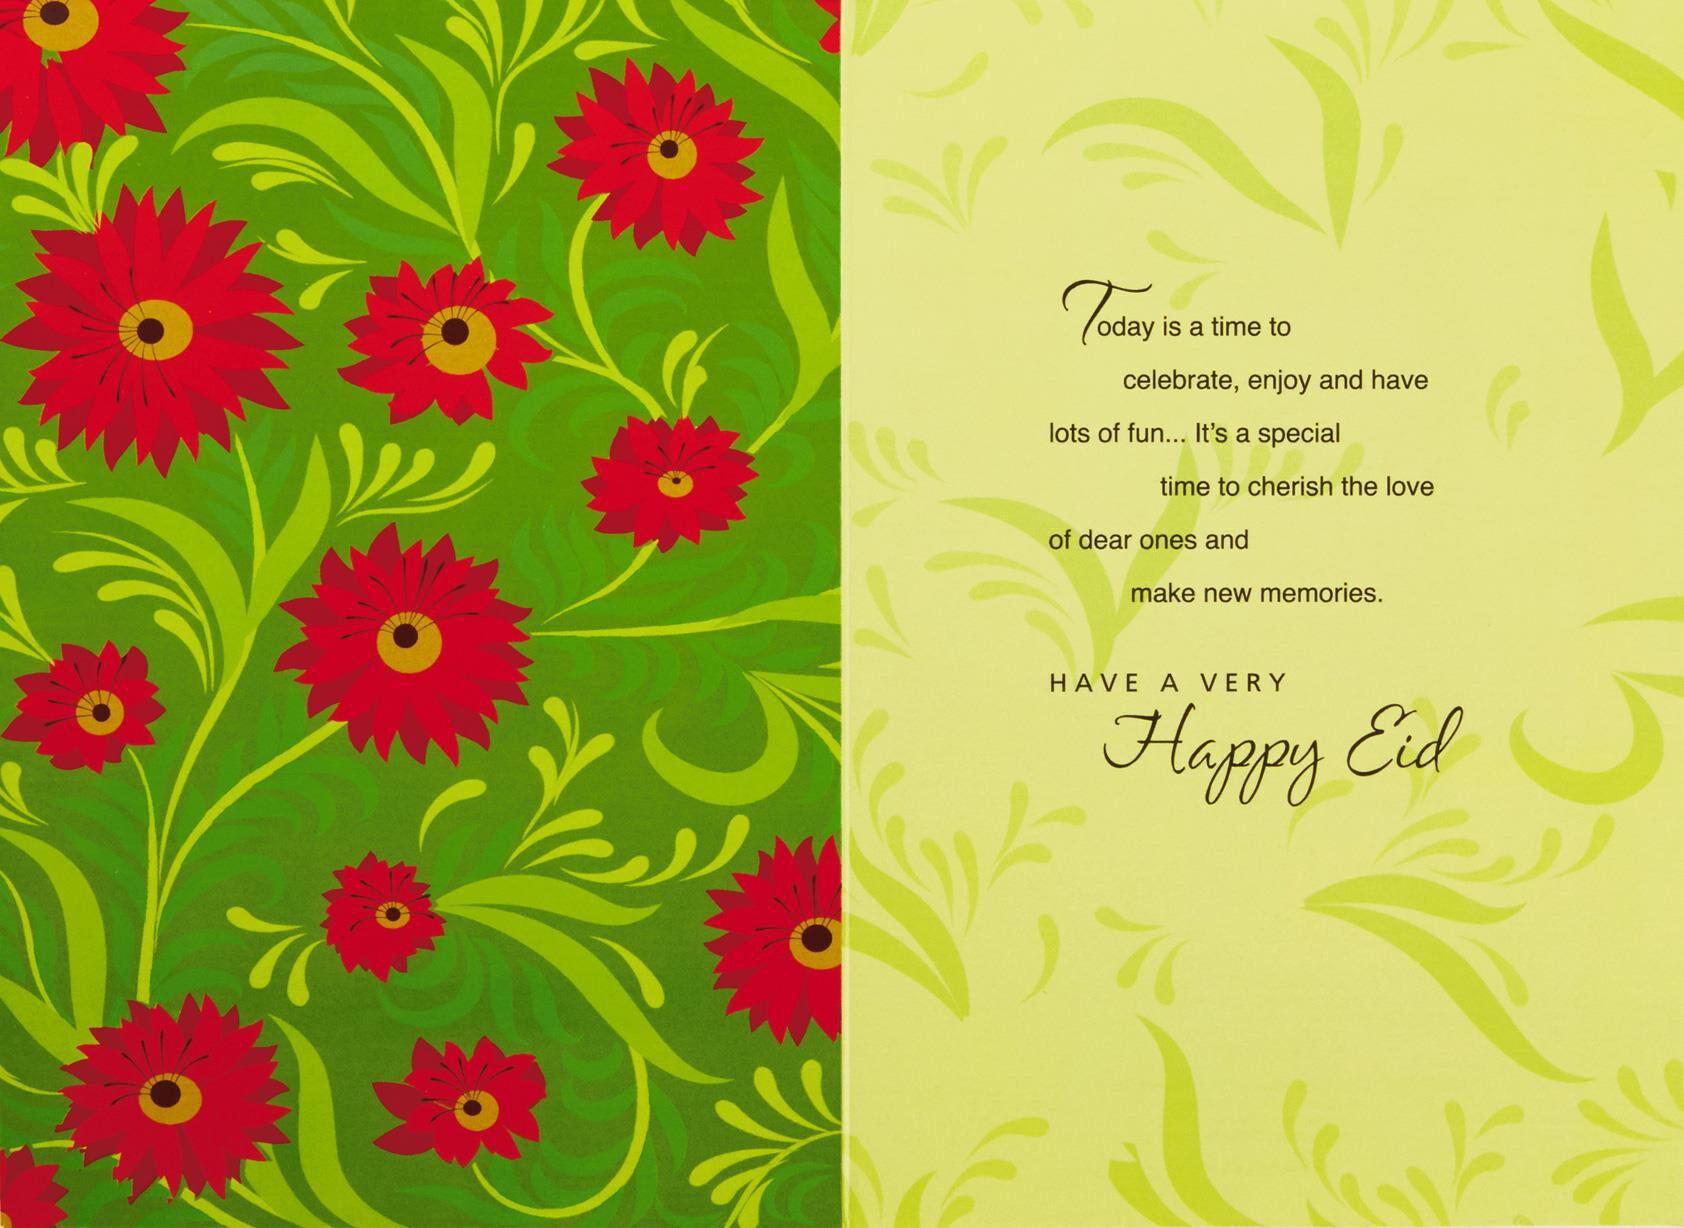 Wonderful Formal Eid Al-Fitr Greeting - Red-Floral-Greeting-Eid-alFitr-Cards-Pack-of-6-root-699ETH1059_PV  Picture_655033 .jpg?sw\u003d512\u0026sh\u003d512\u0026sm\u003dfit